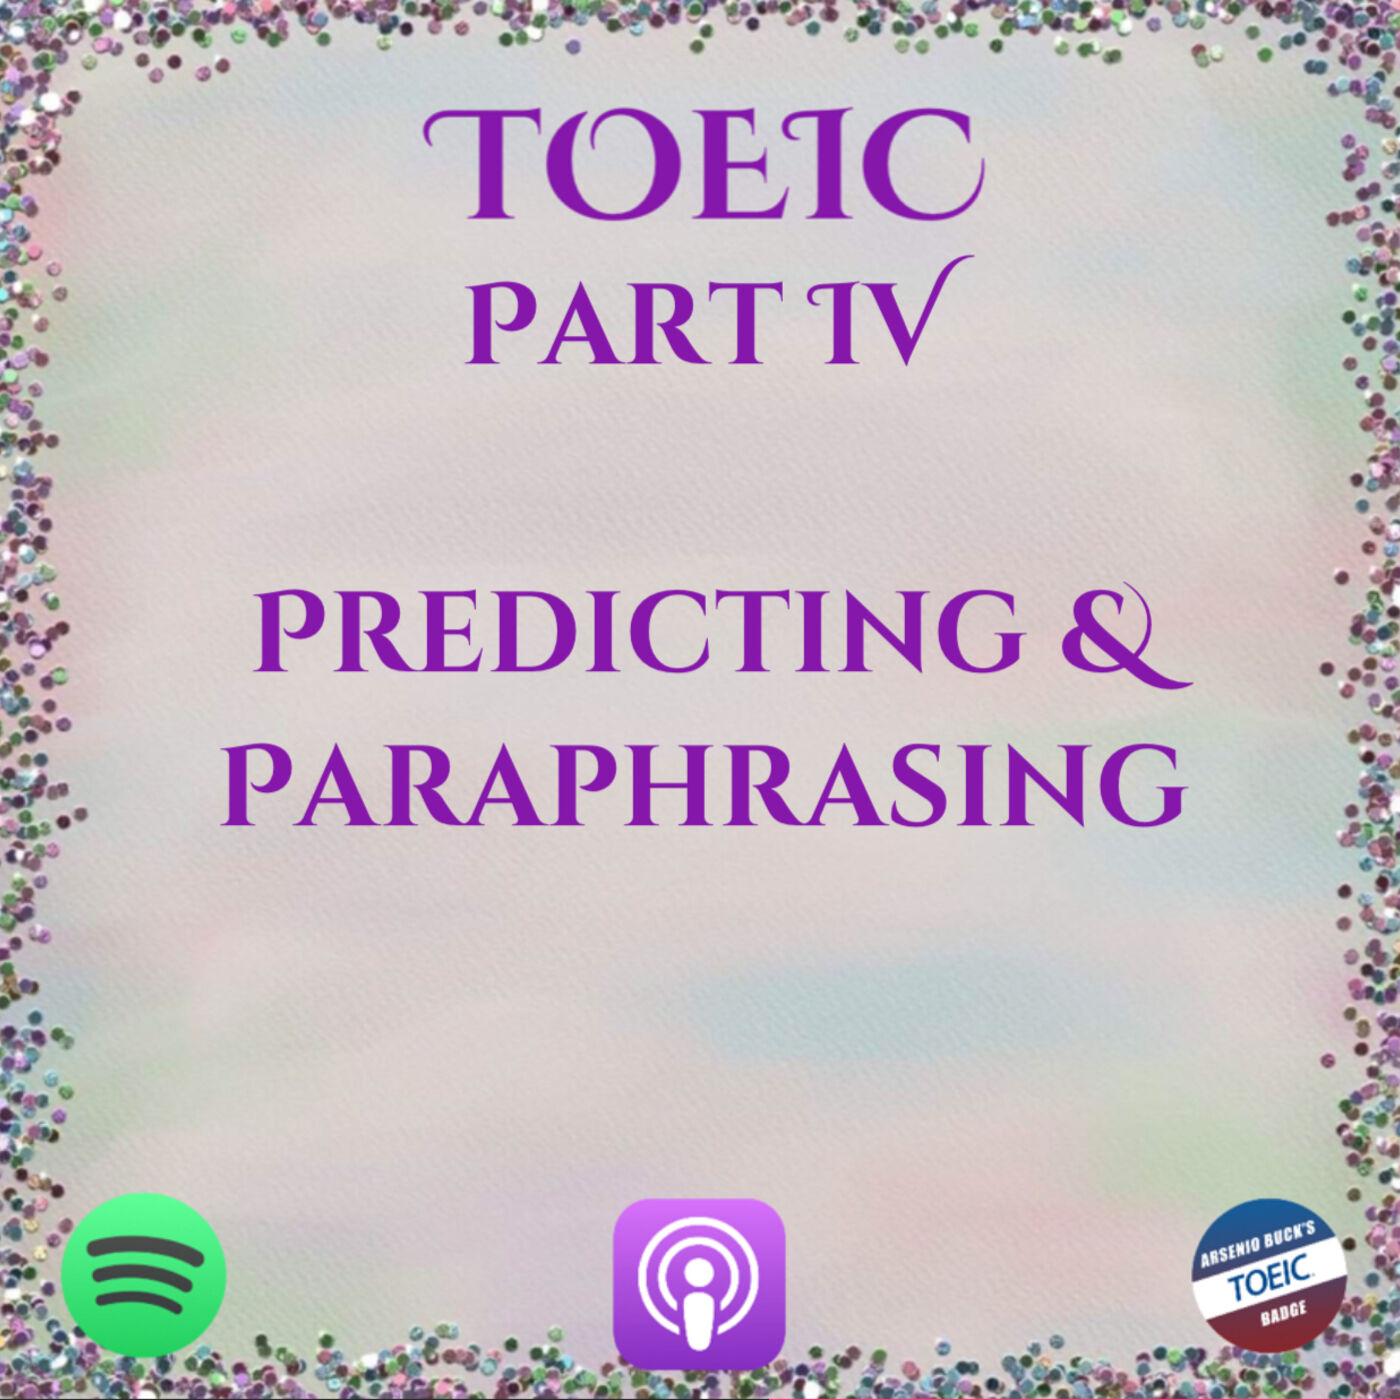 TOEIC | Talks | Part IV | Predicting & Paraphrasing